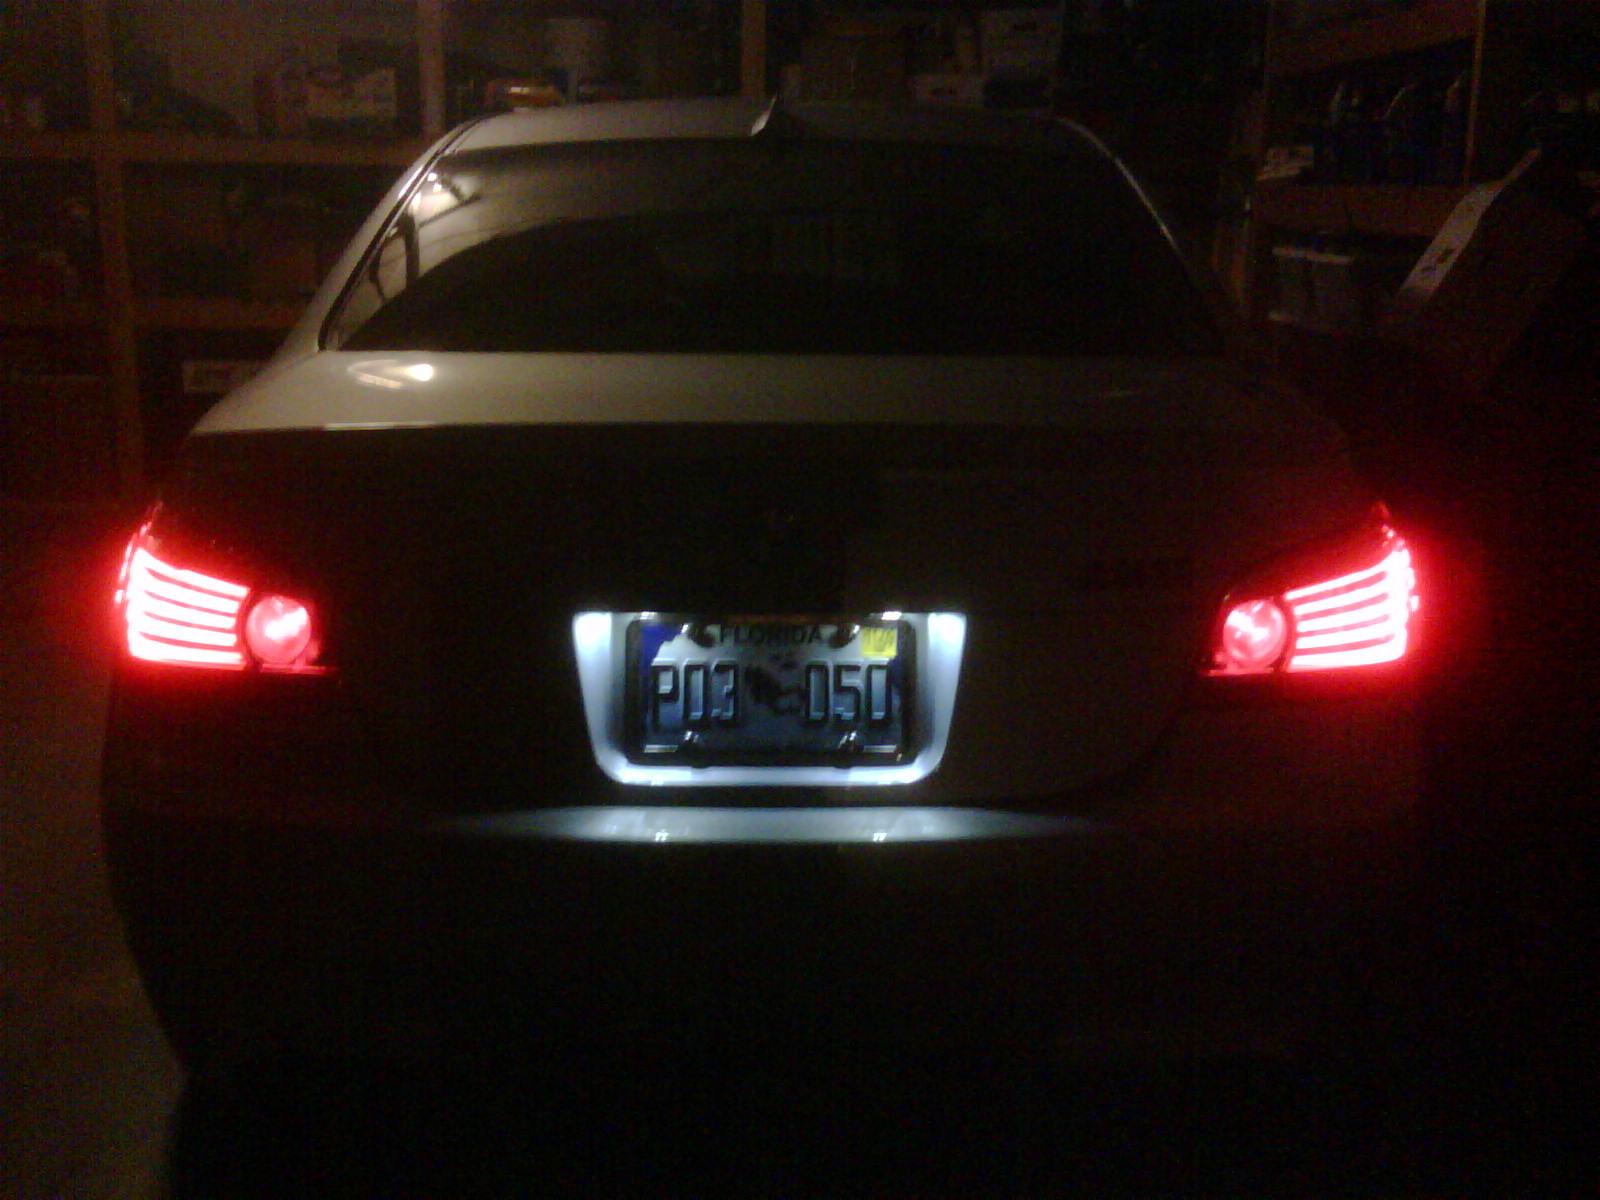 Oem Led License Plate Lights Pics Bmw M5 Forum And M6